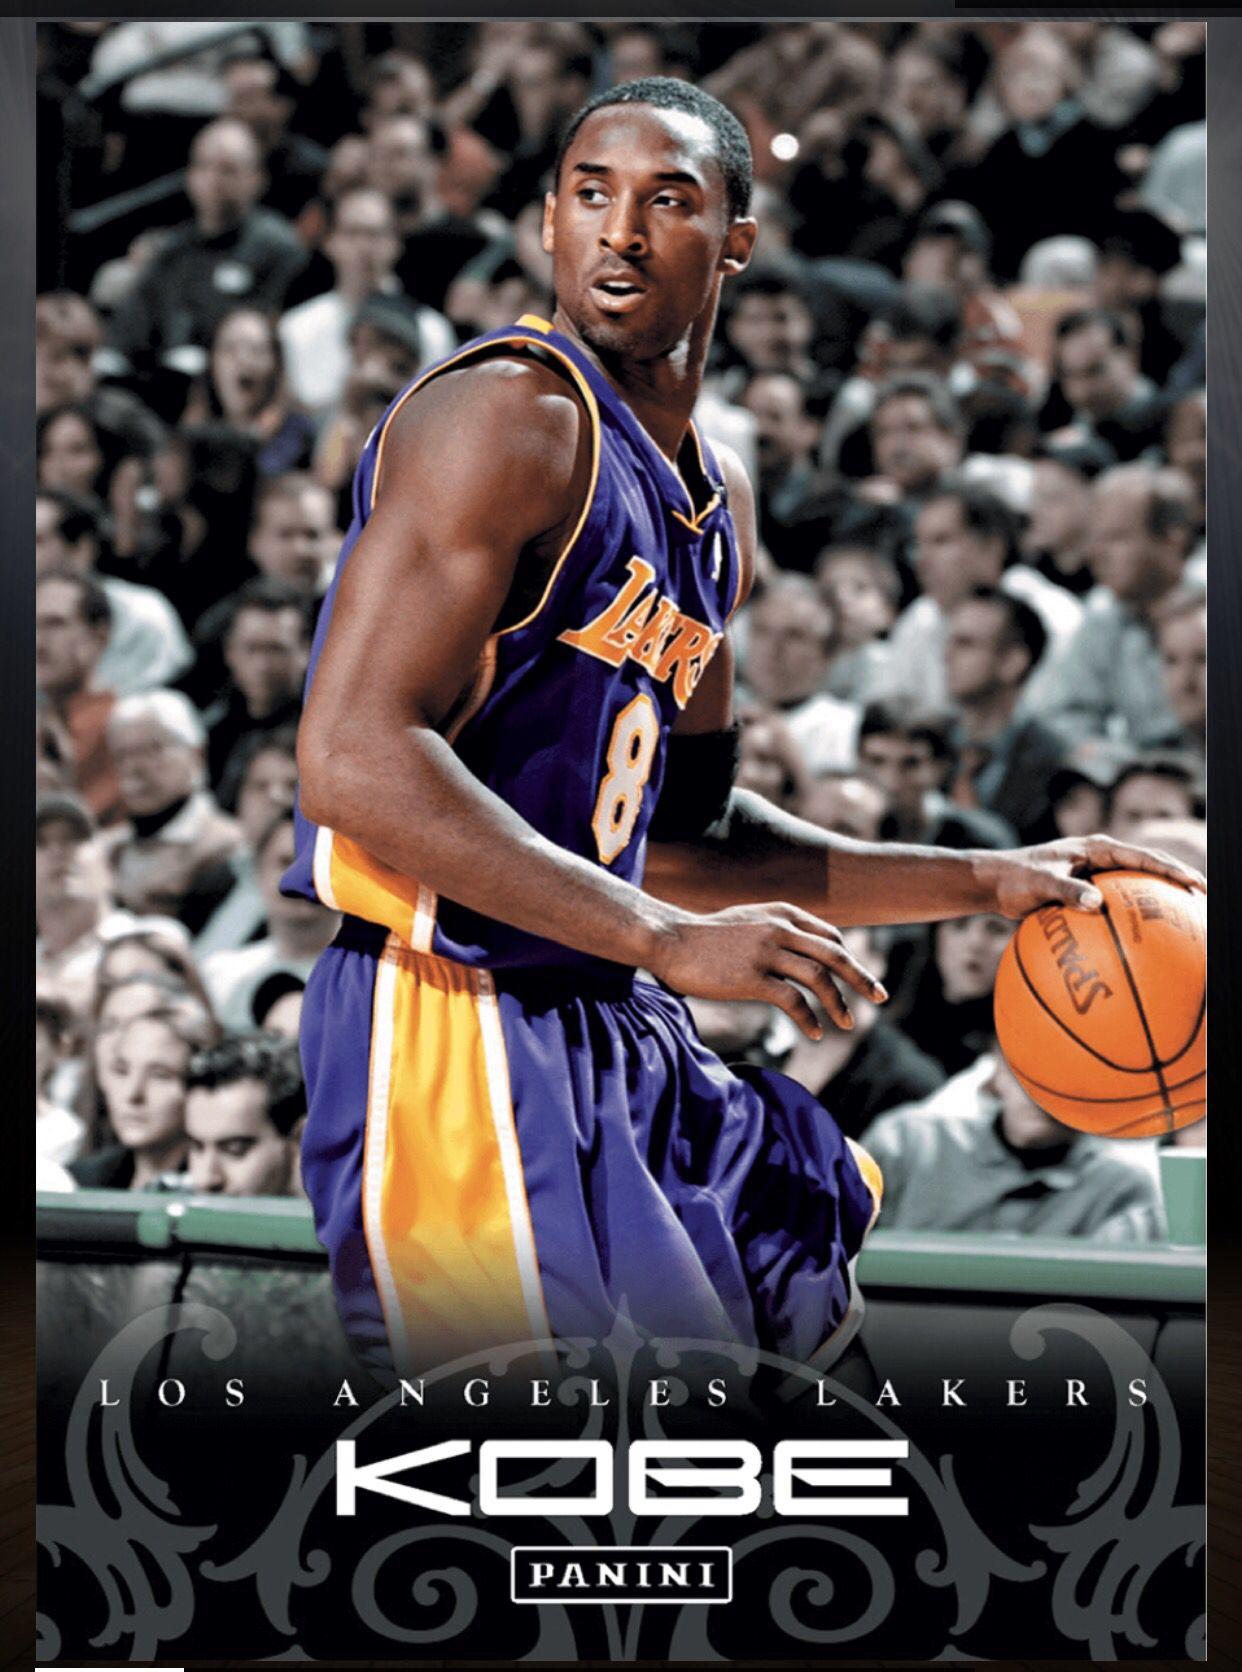 Kobe Bryant Los Angeles Lakers 86 Kobe Anthology Card 2015 2016 Panini Dunk Kobe Bryant Black Mamba Kobe Bryant Kobe Bryant Nba